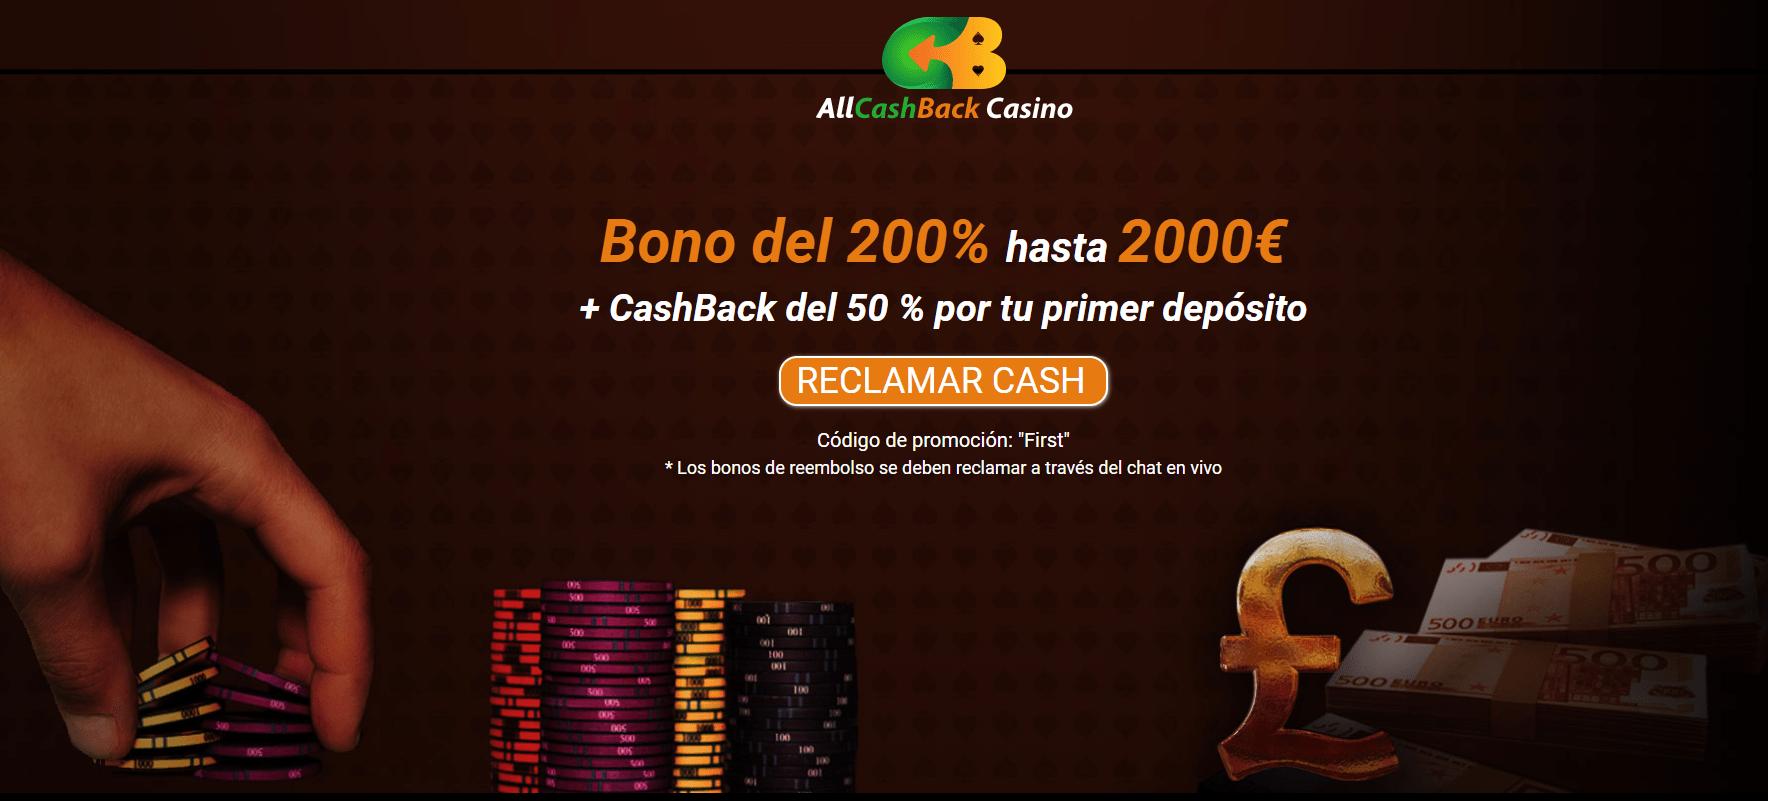 Promociones All cashBack casino